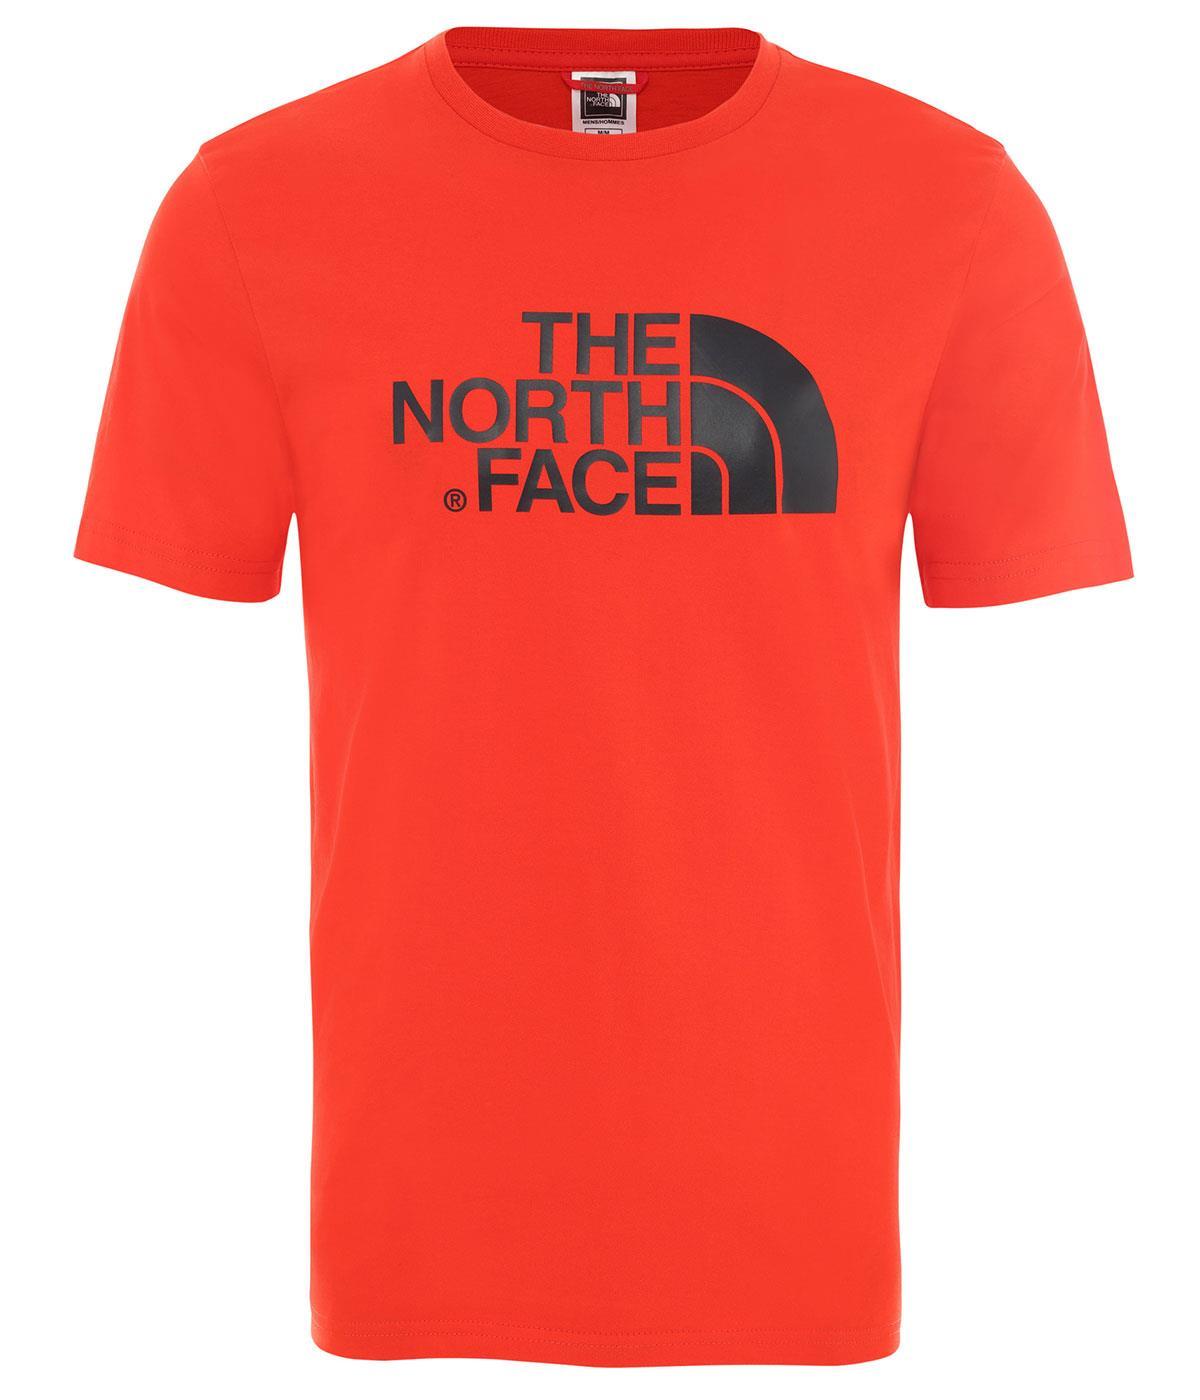 The Northface Erkek S/S EASY Tişört - EU NF0A2TX3WU51